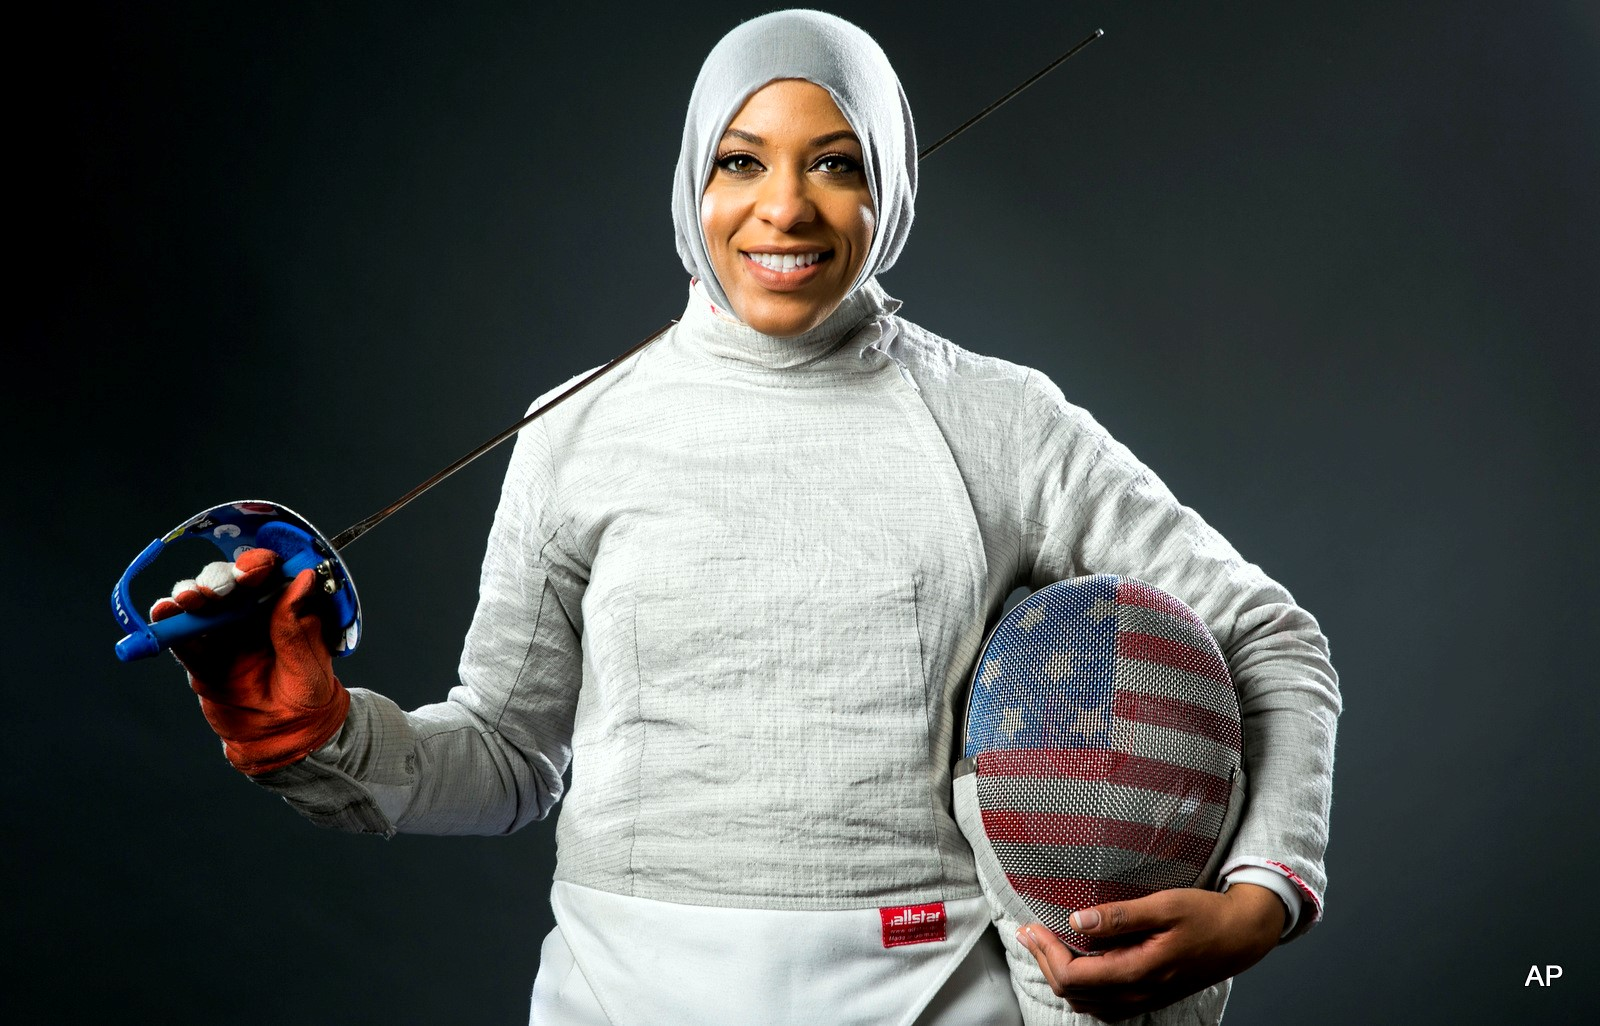 Amid An Atmosphere Of Islamophobia, Ibtihaj Muhammad Makes History As First Hijabi On Team USA